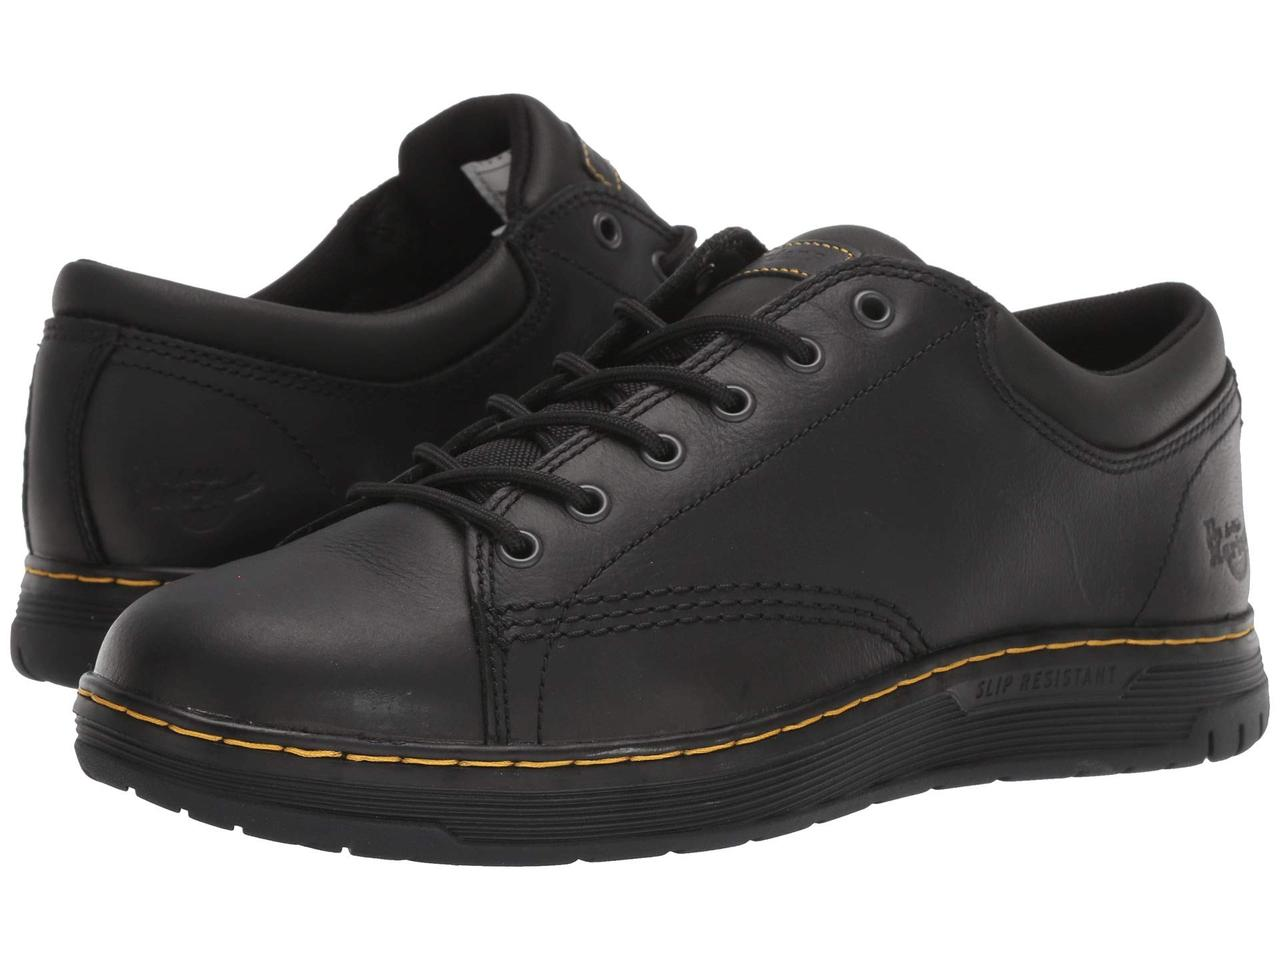 Кроссовки/Кеды (Оригинал) Dr. Martens Work Maltby Soft Toe SR Black/Black/Black/Black